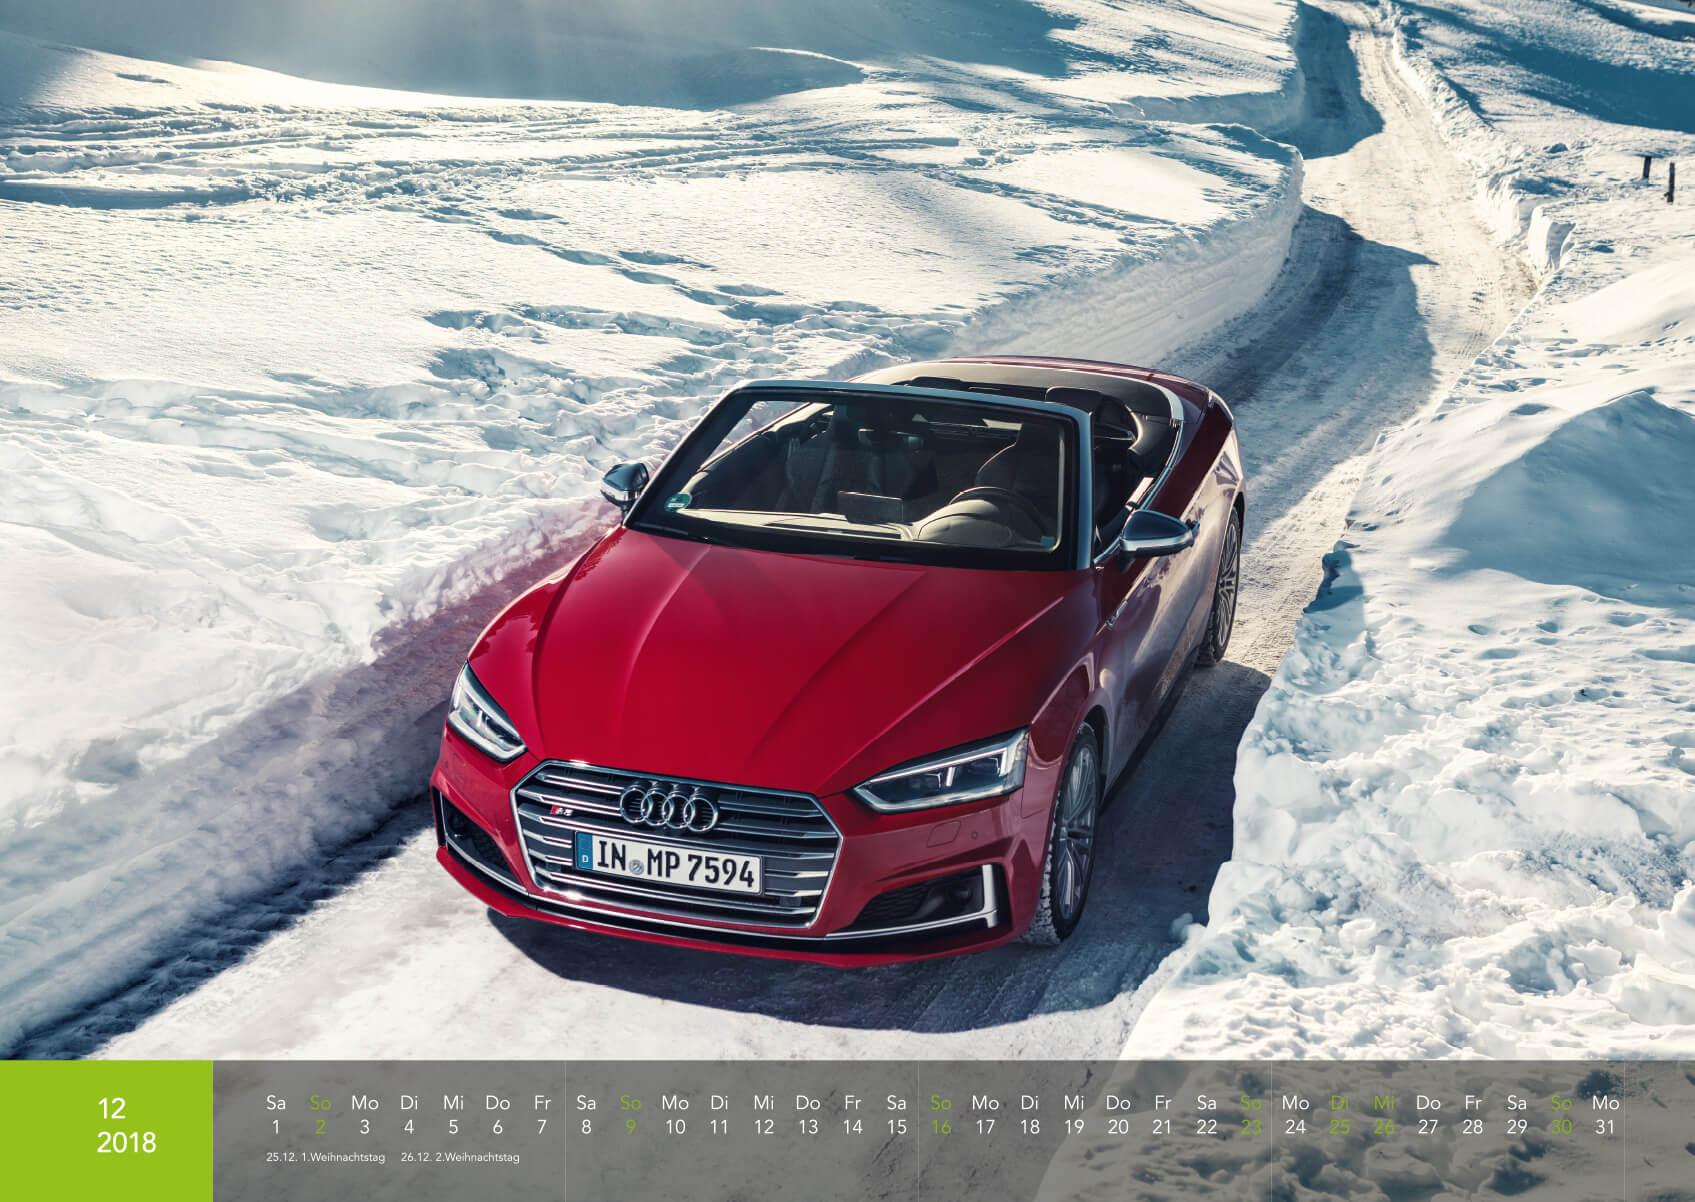 Audi Kalender 2018 - S5 Cabrio